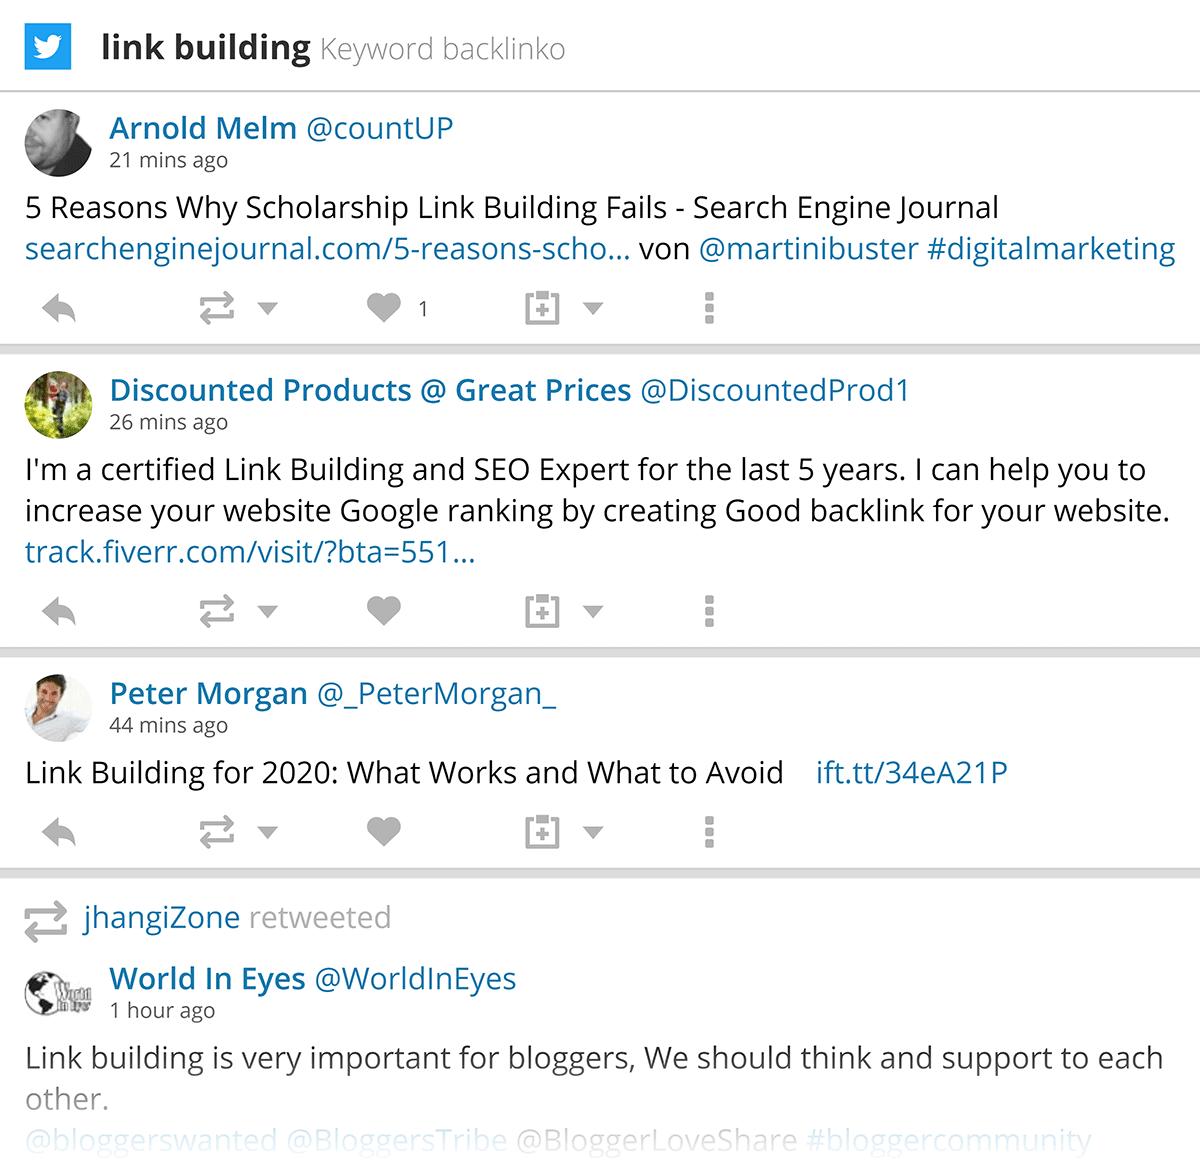 Hootsuite – Link building stream